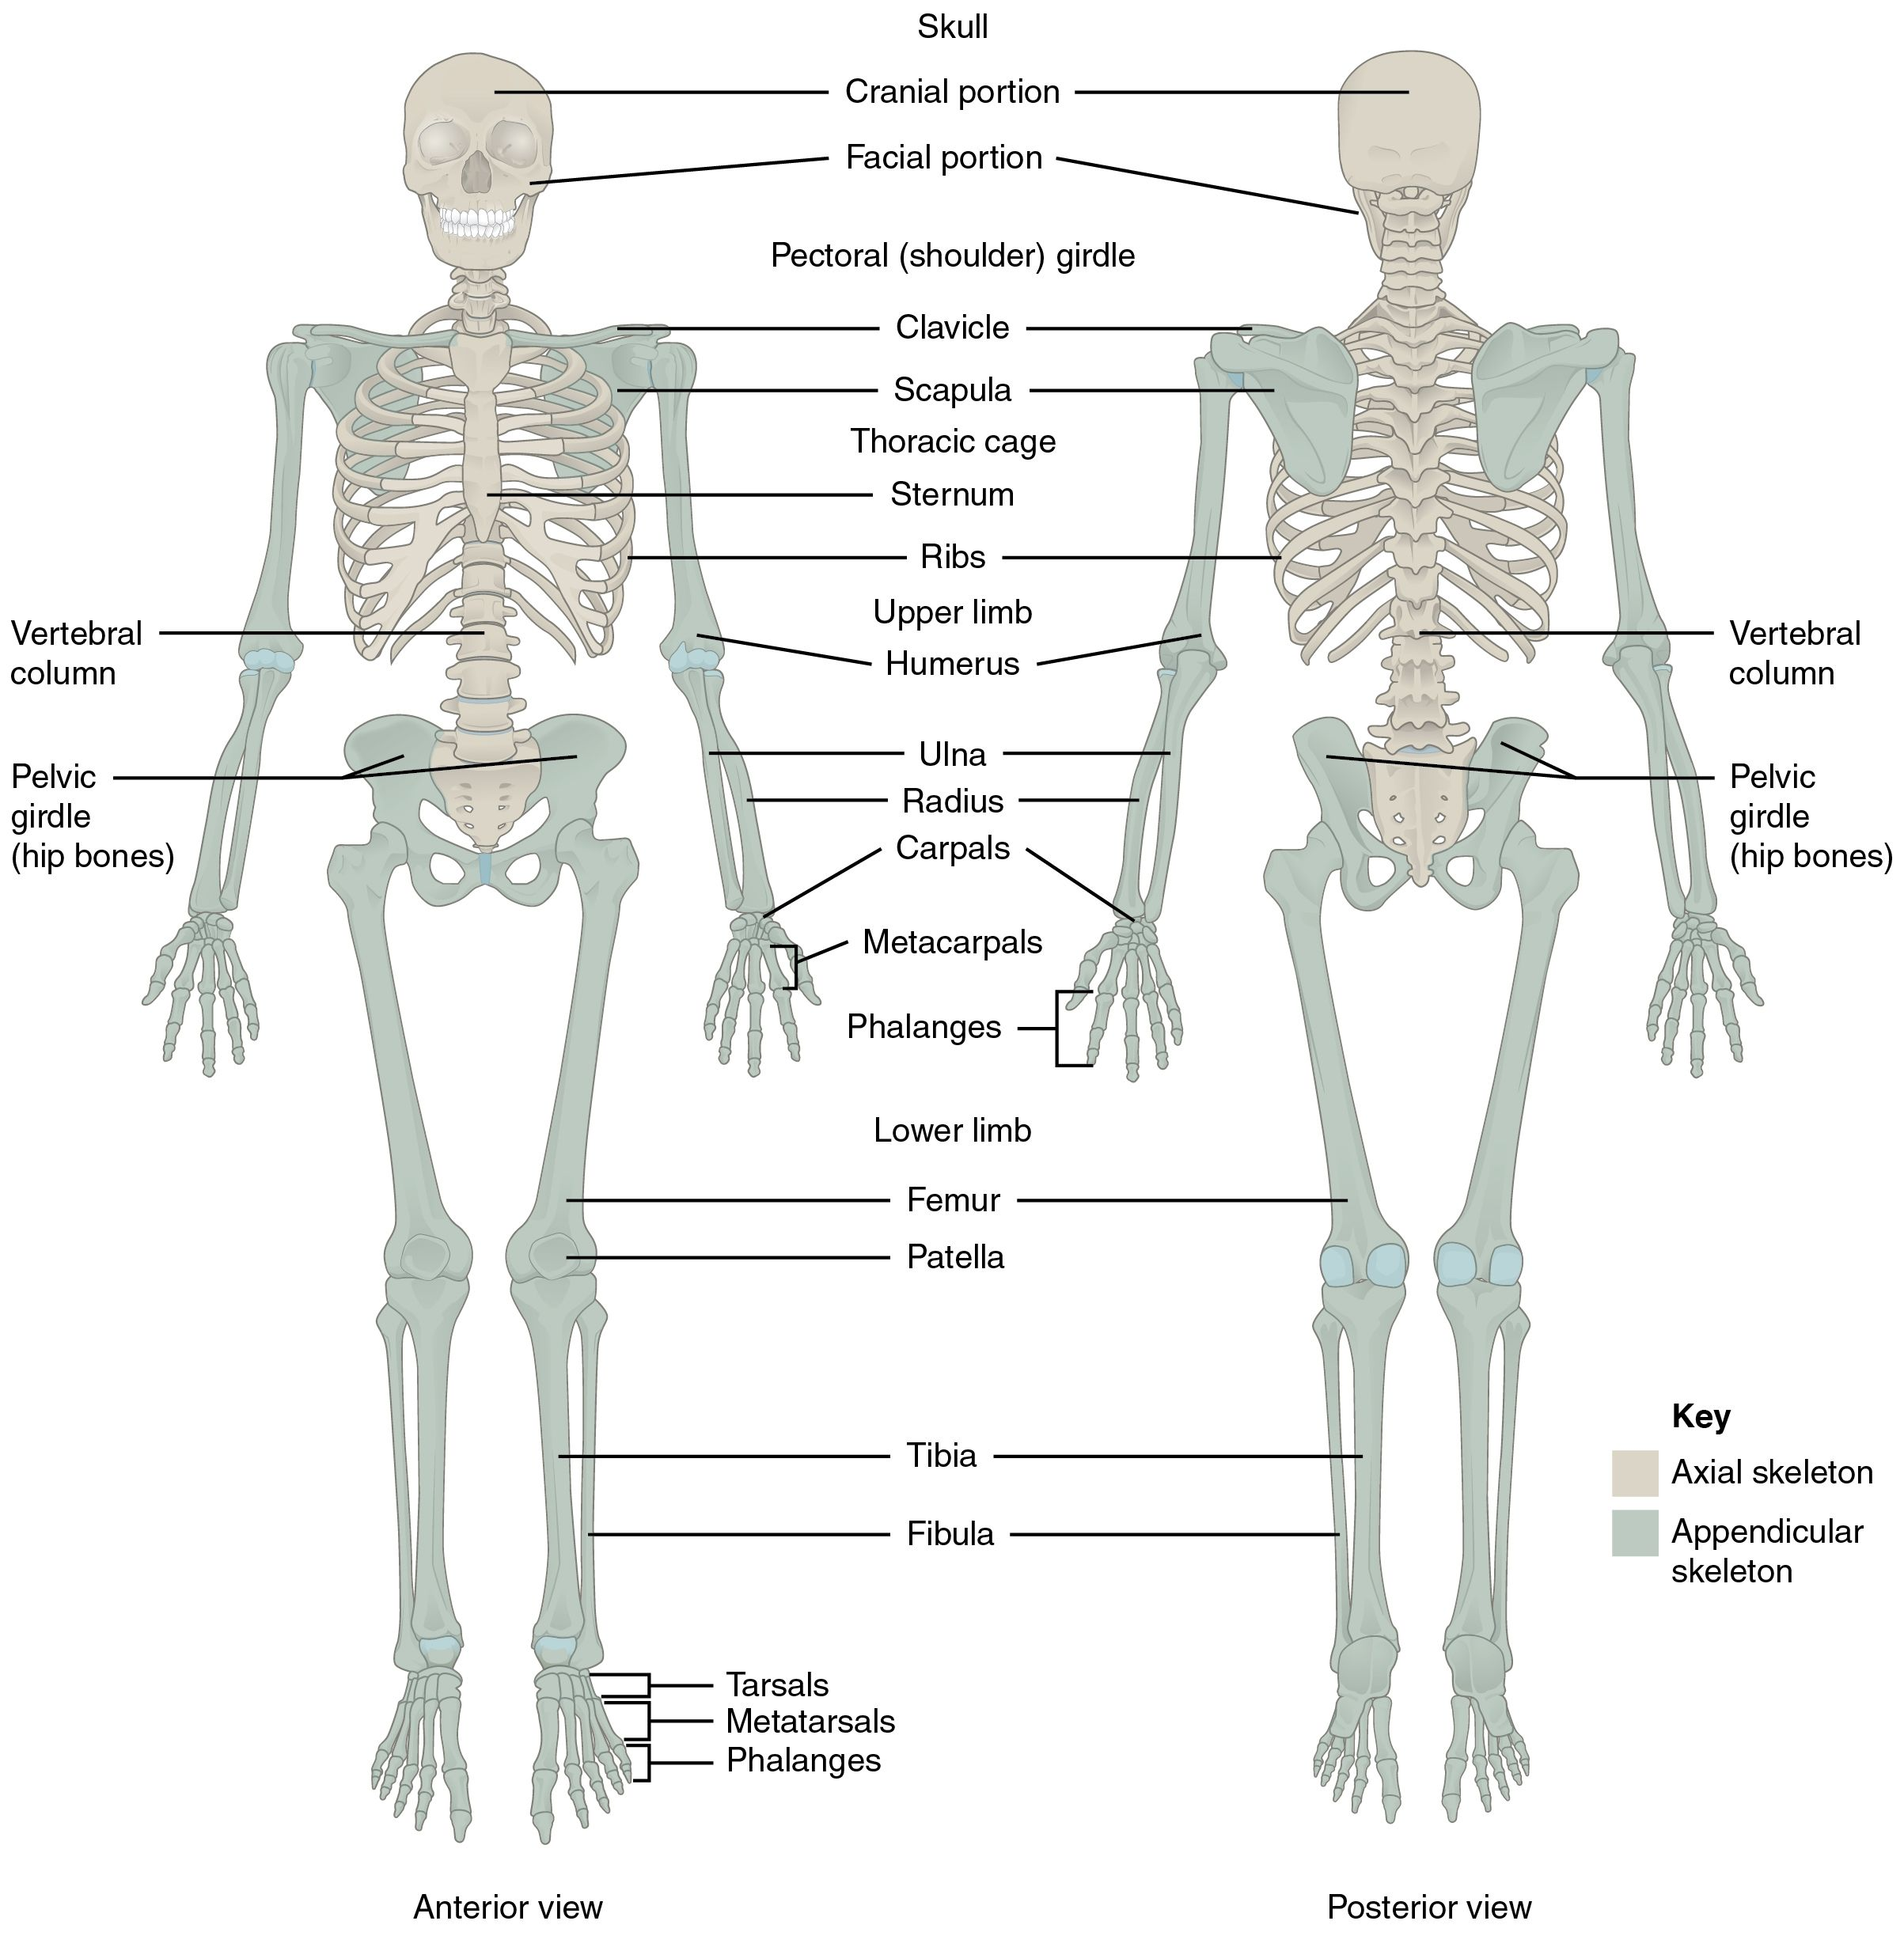 medium resolution of back bones structure bone structure lower back humananatomybody diagram of lower back spine back bones structure